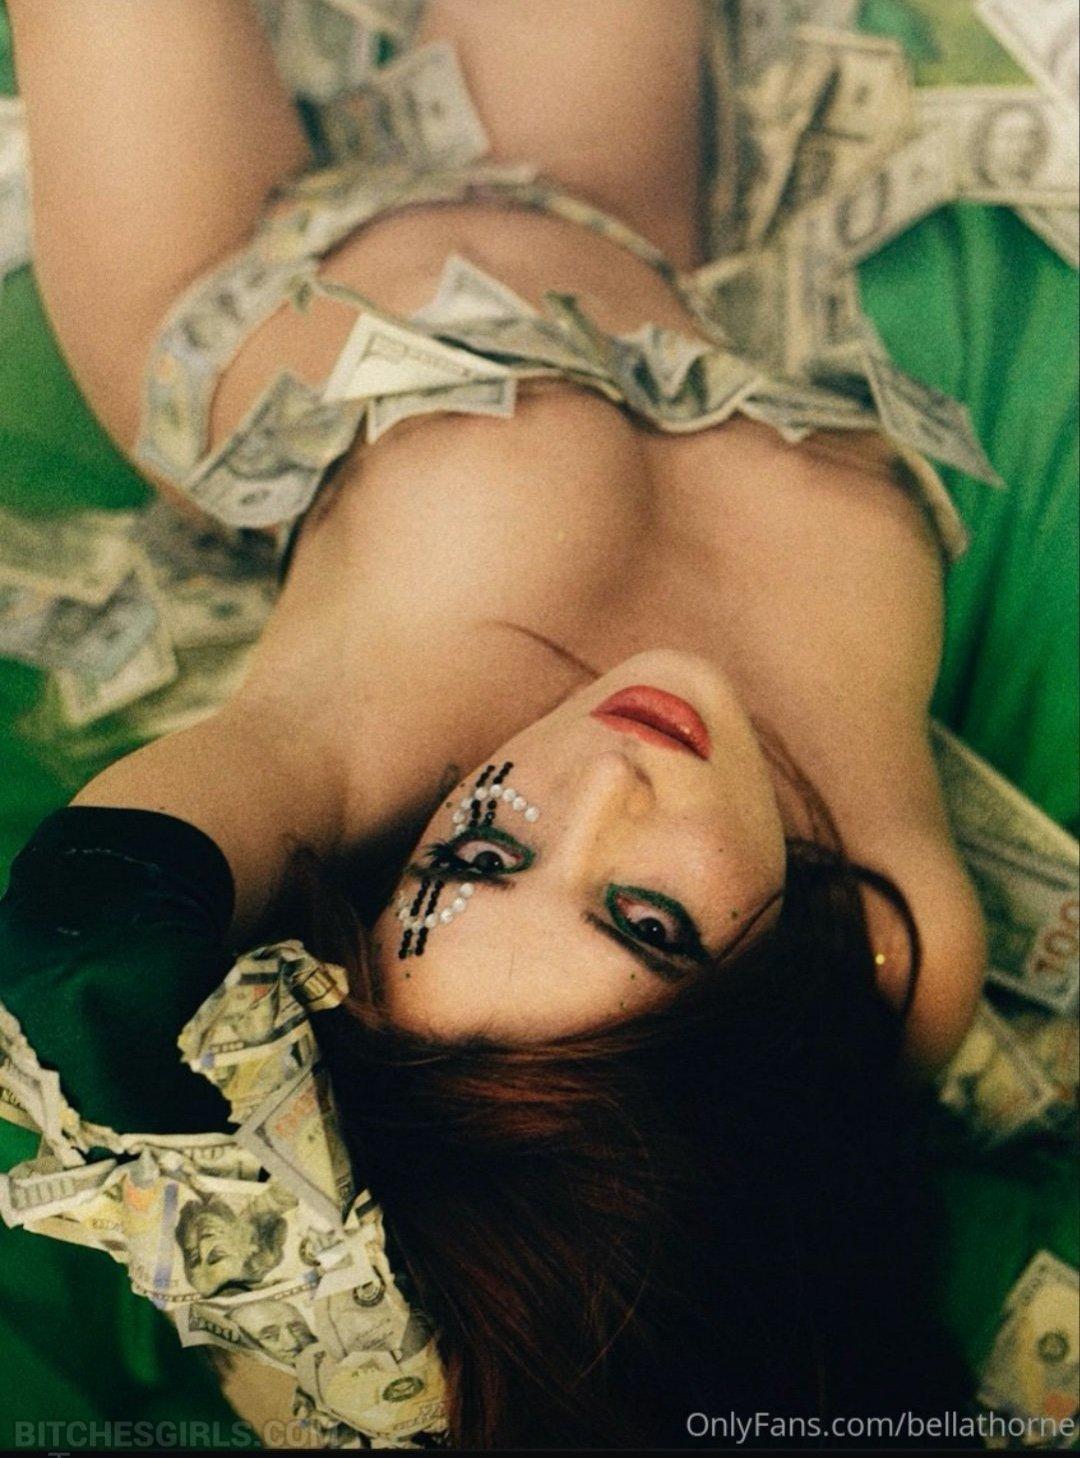 Bella Thorne Bellathorne Onlyfans Nude Leaks 0041